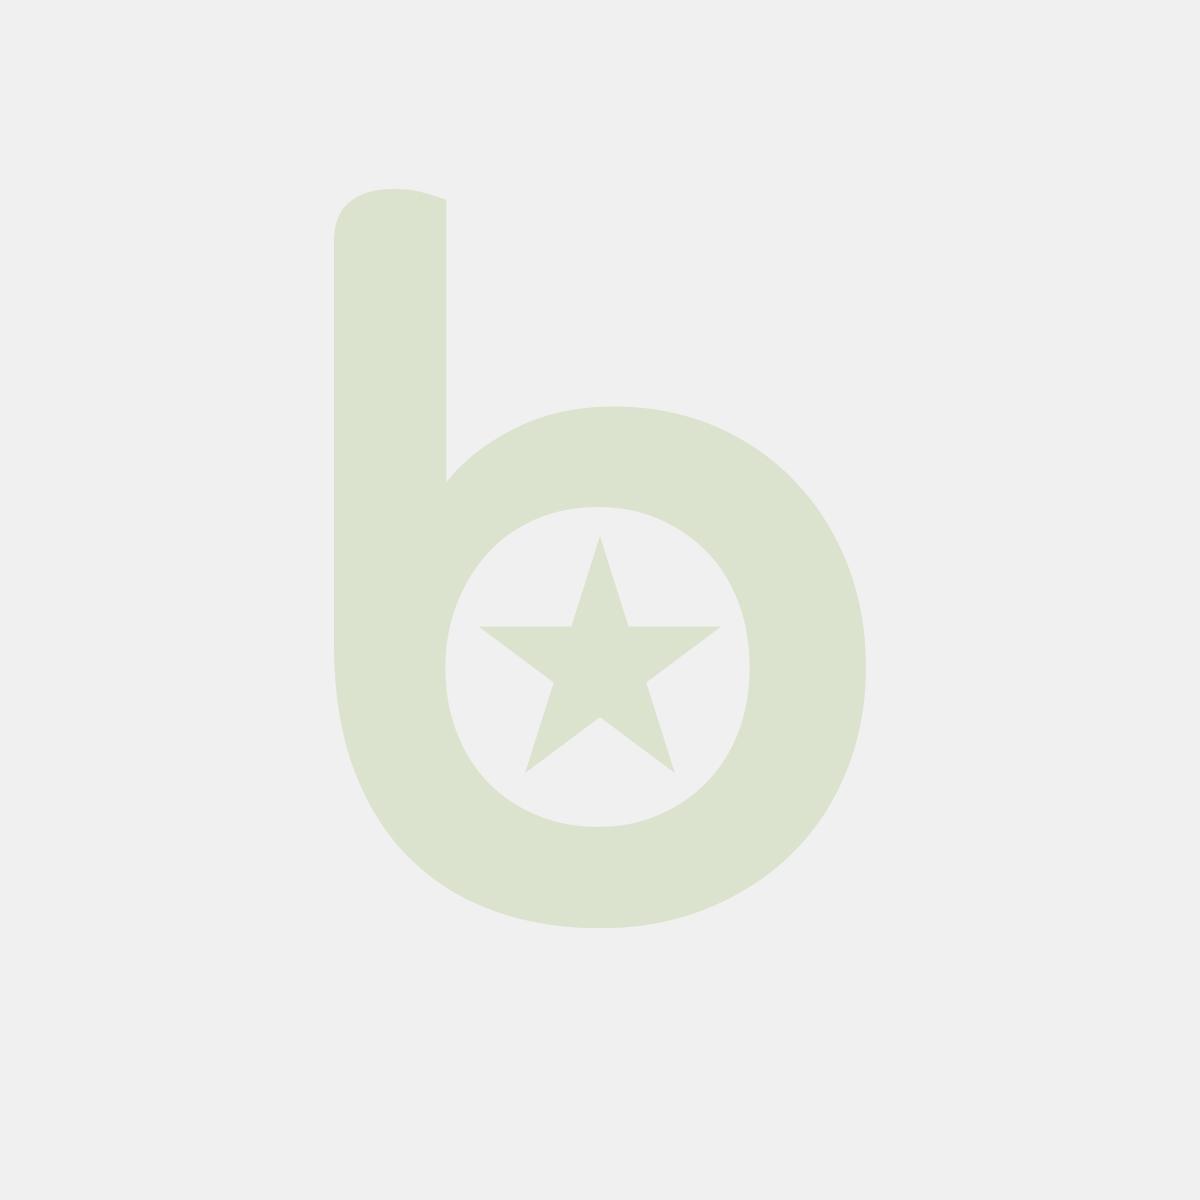 Miska z trzciny cukrowej 375ml bagasse - kolor naturalny 13,2x13,2x5,4cm op. 50 sztuk